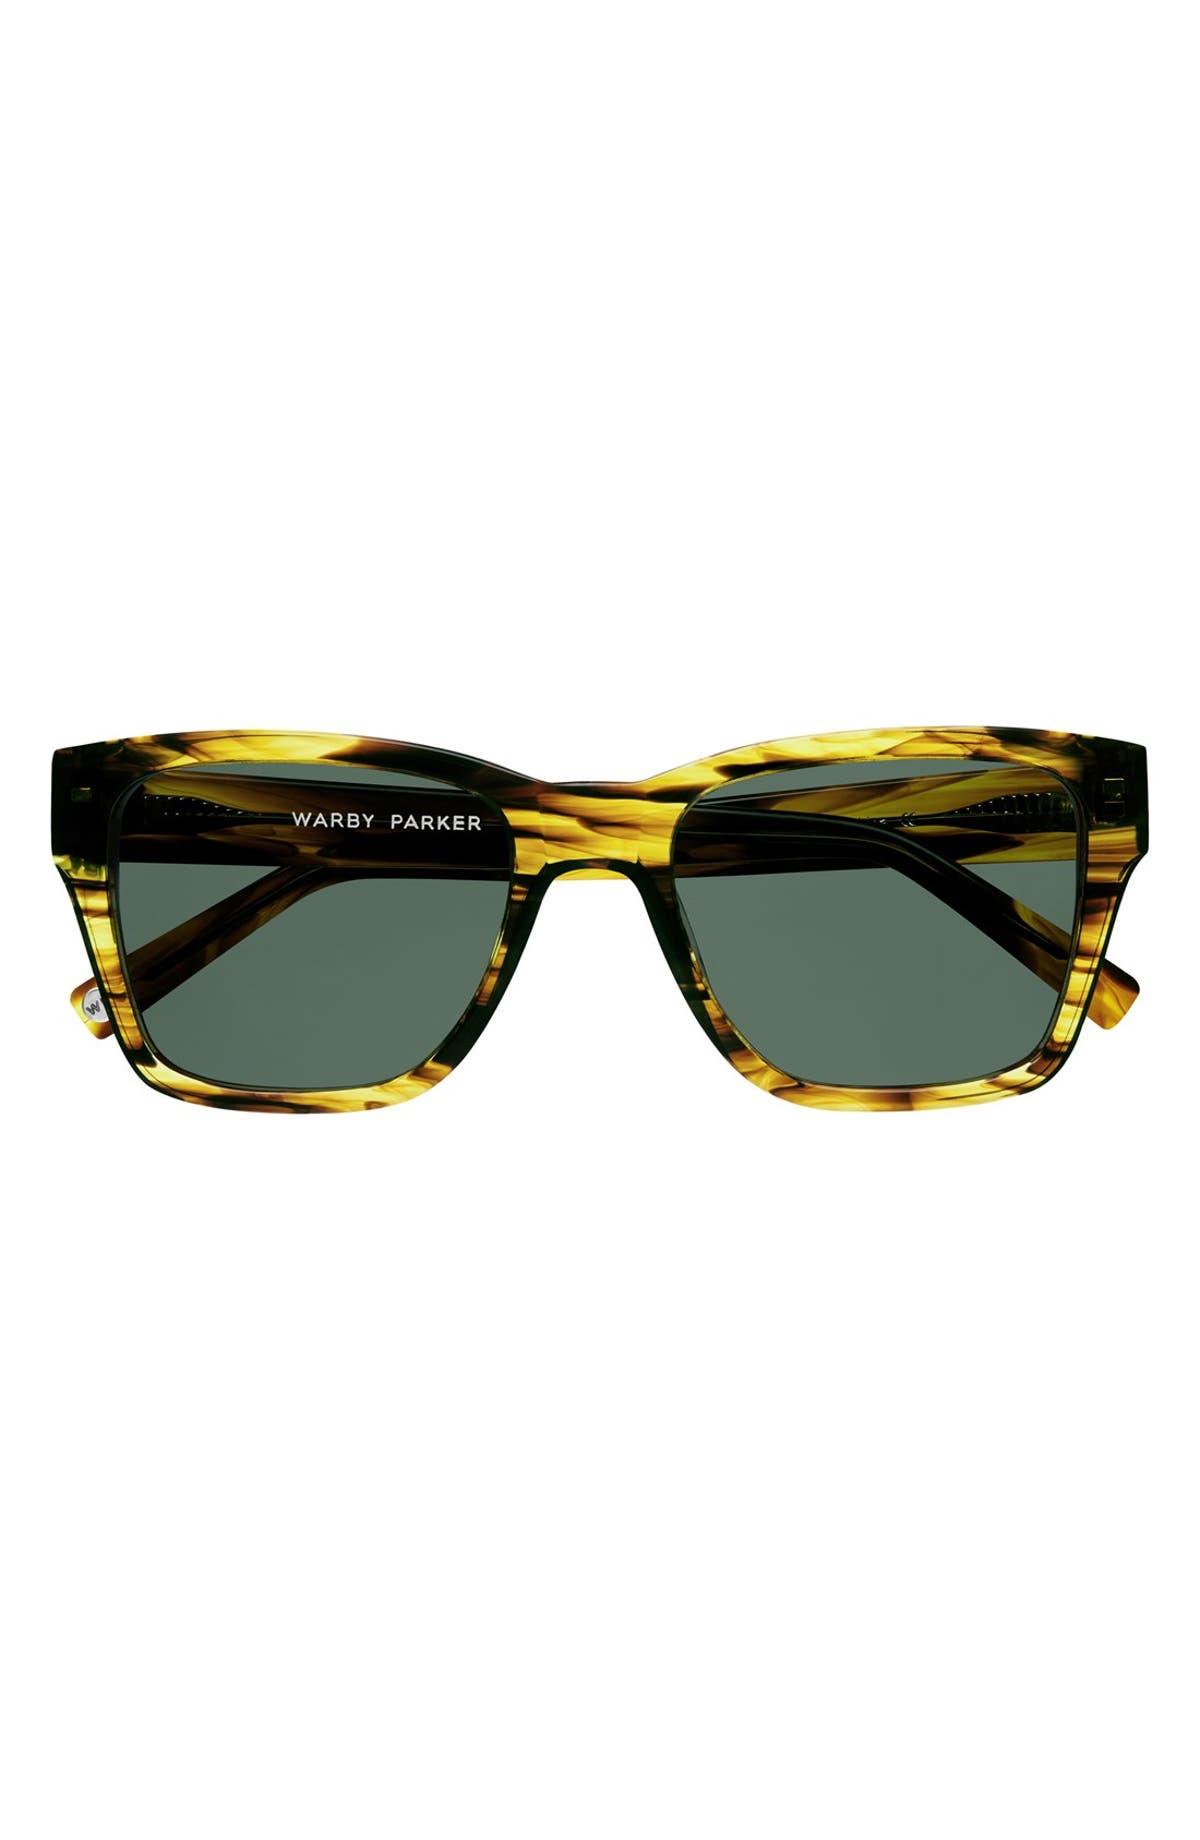 d9a9b37dfe Warby Parker  Robinson  54mm Polarized Sunglasses